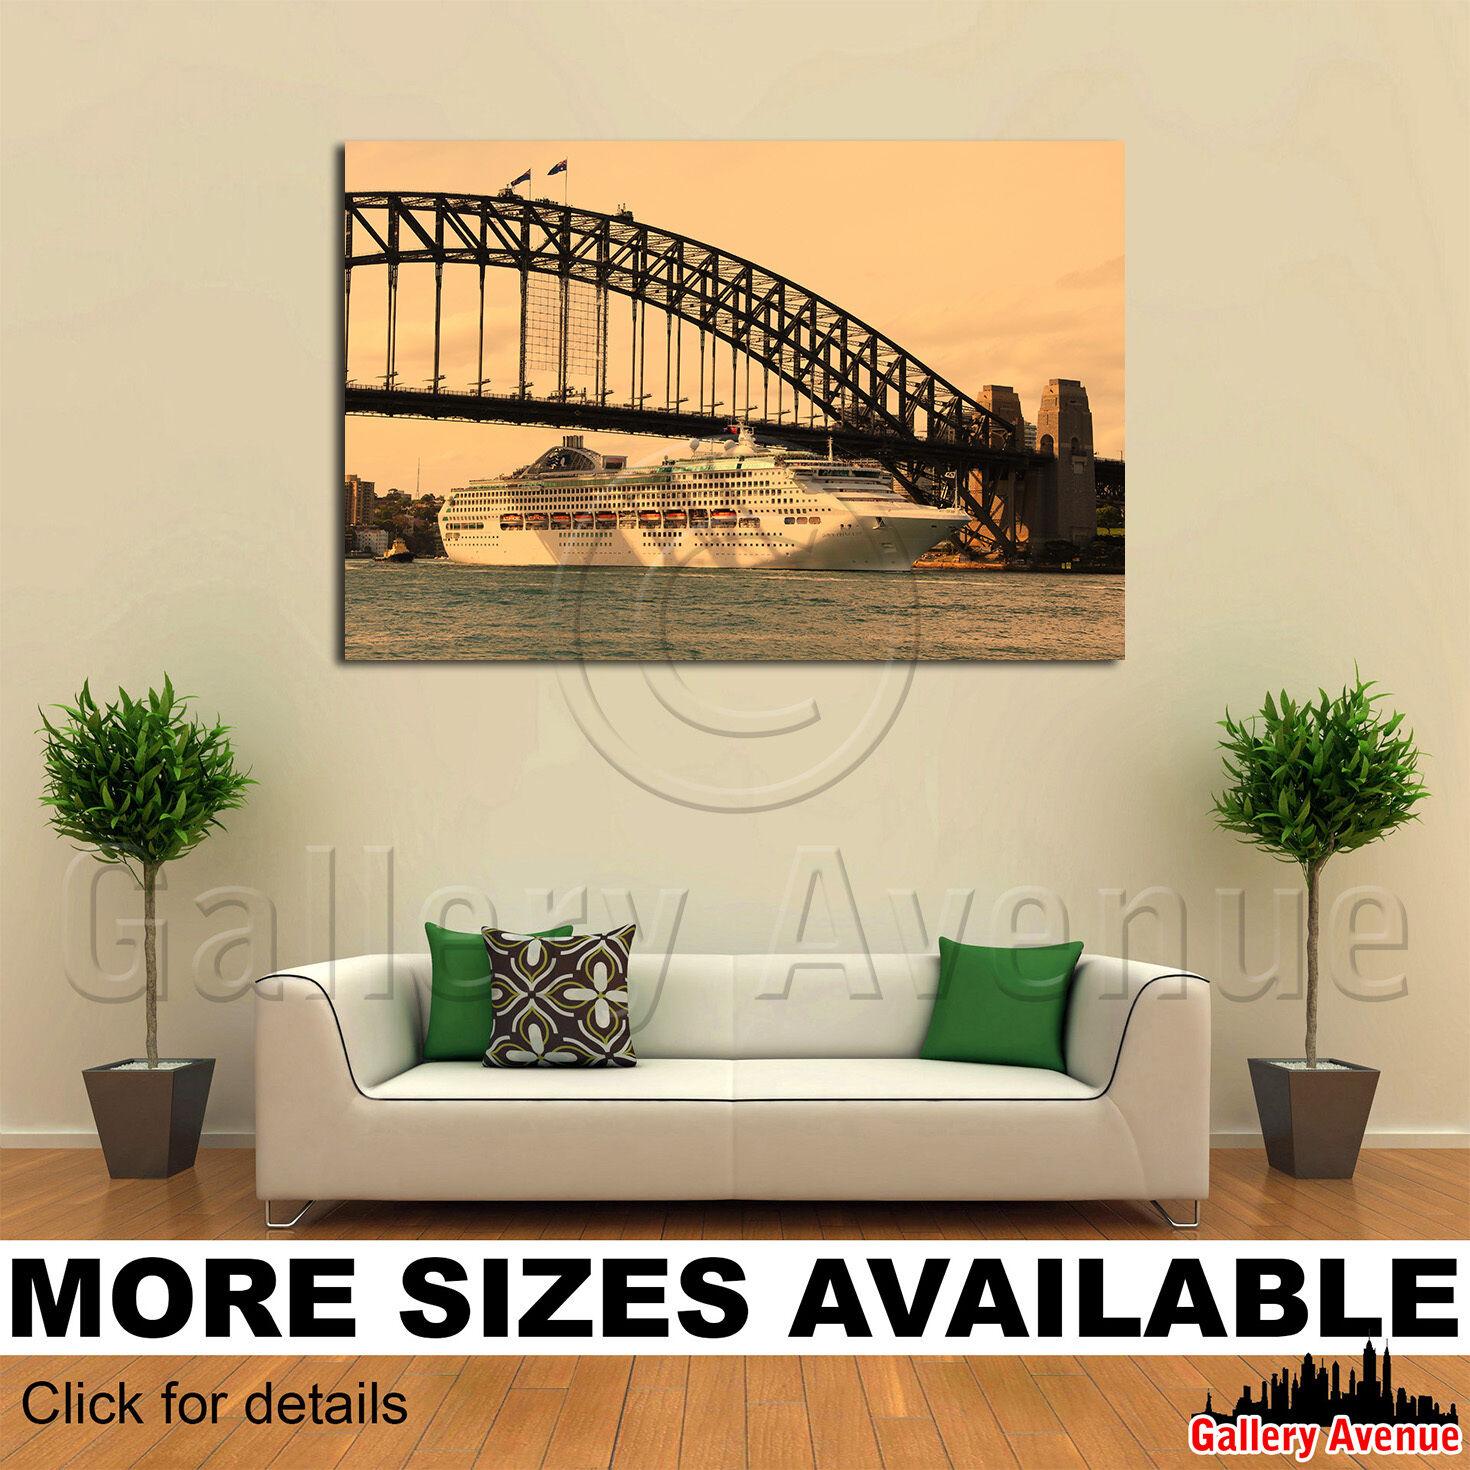 Wall Art Canvas Picture Print - Big Cuiser Ship Bridge 3.2